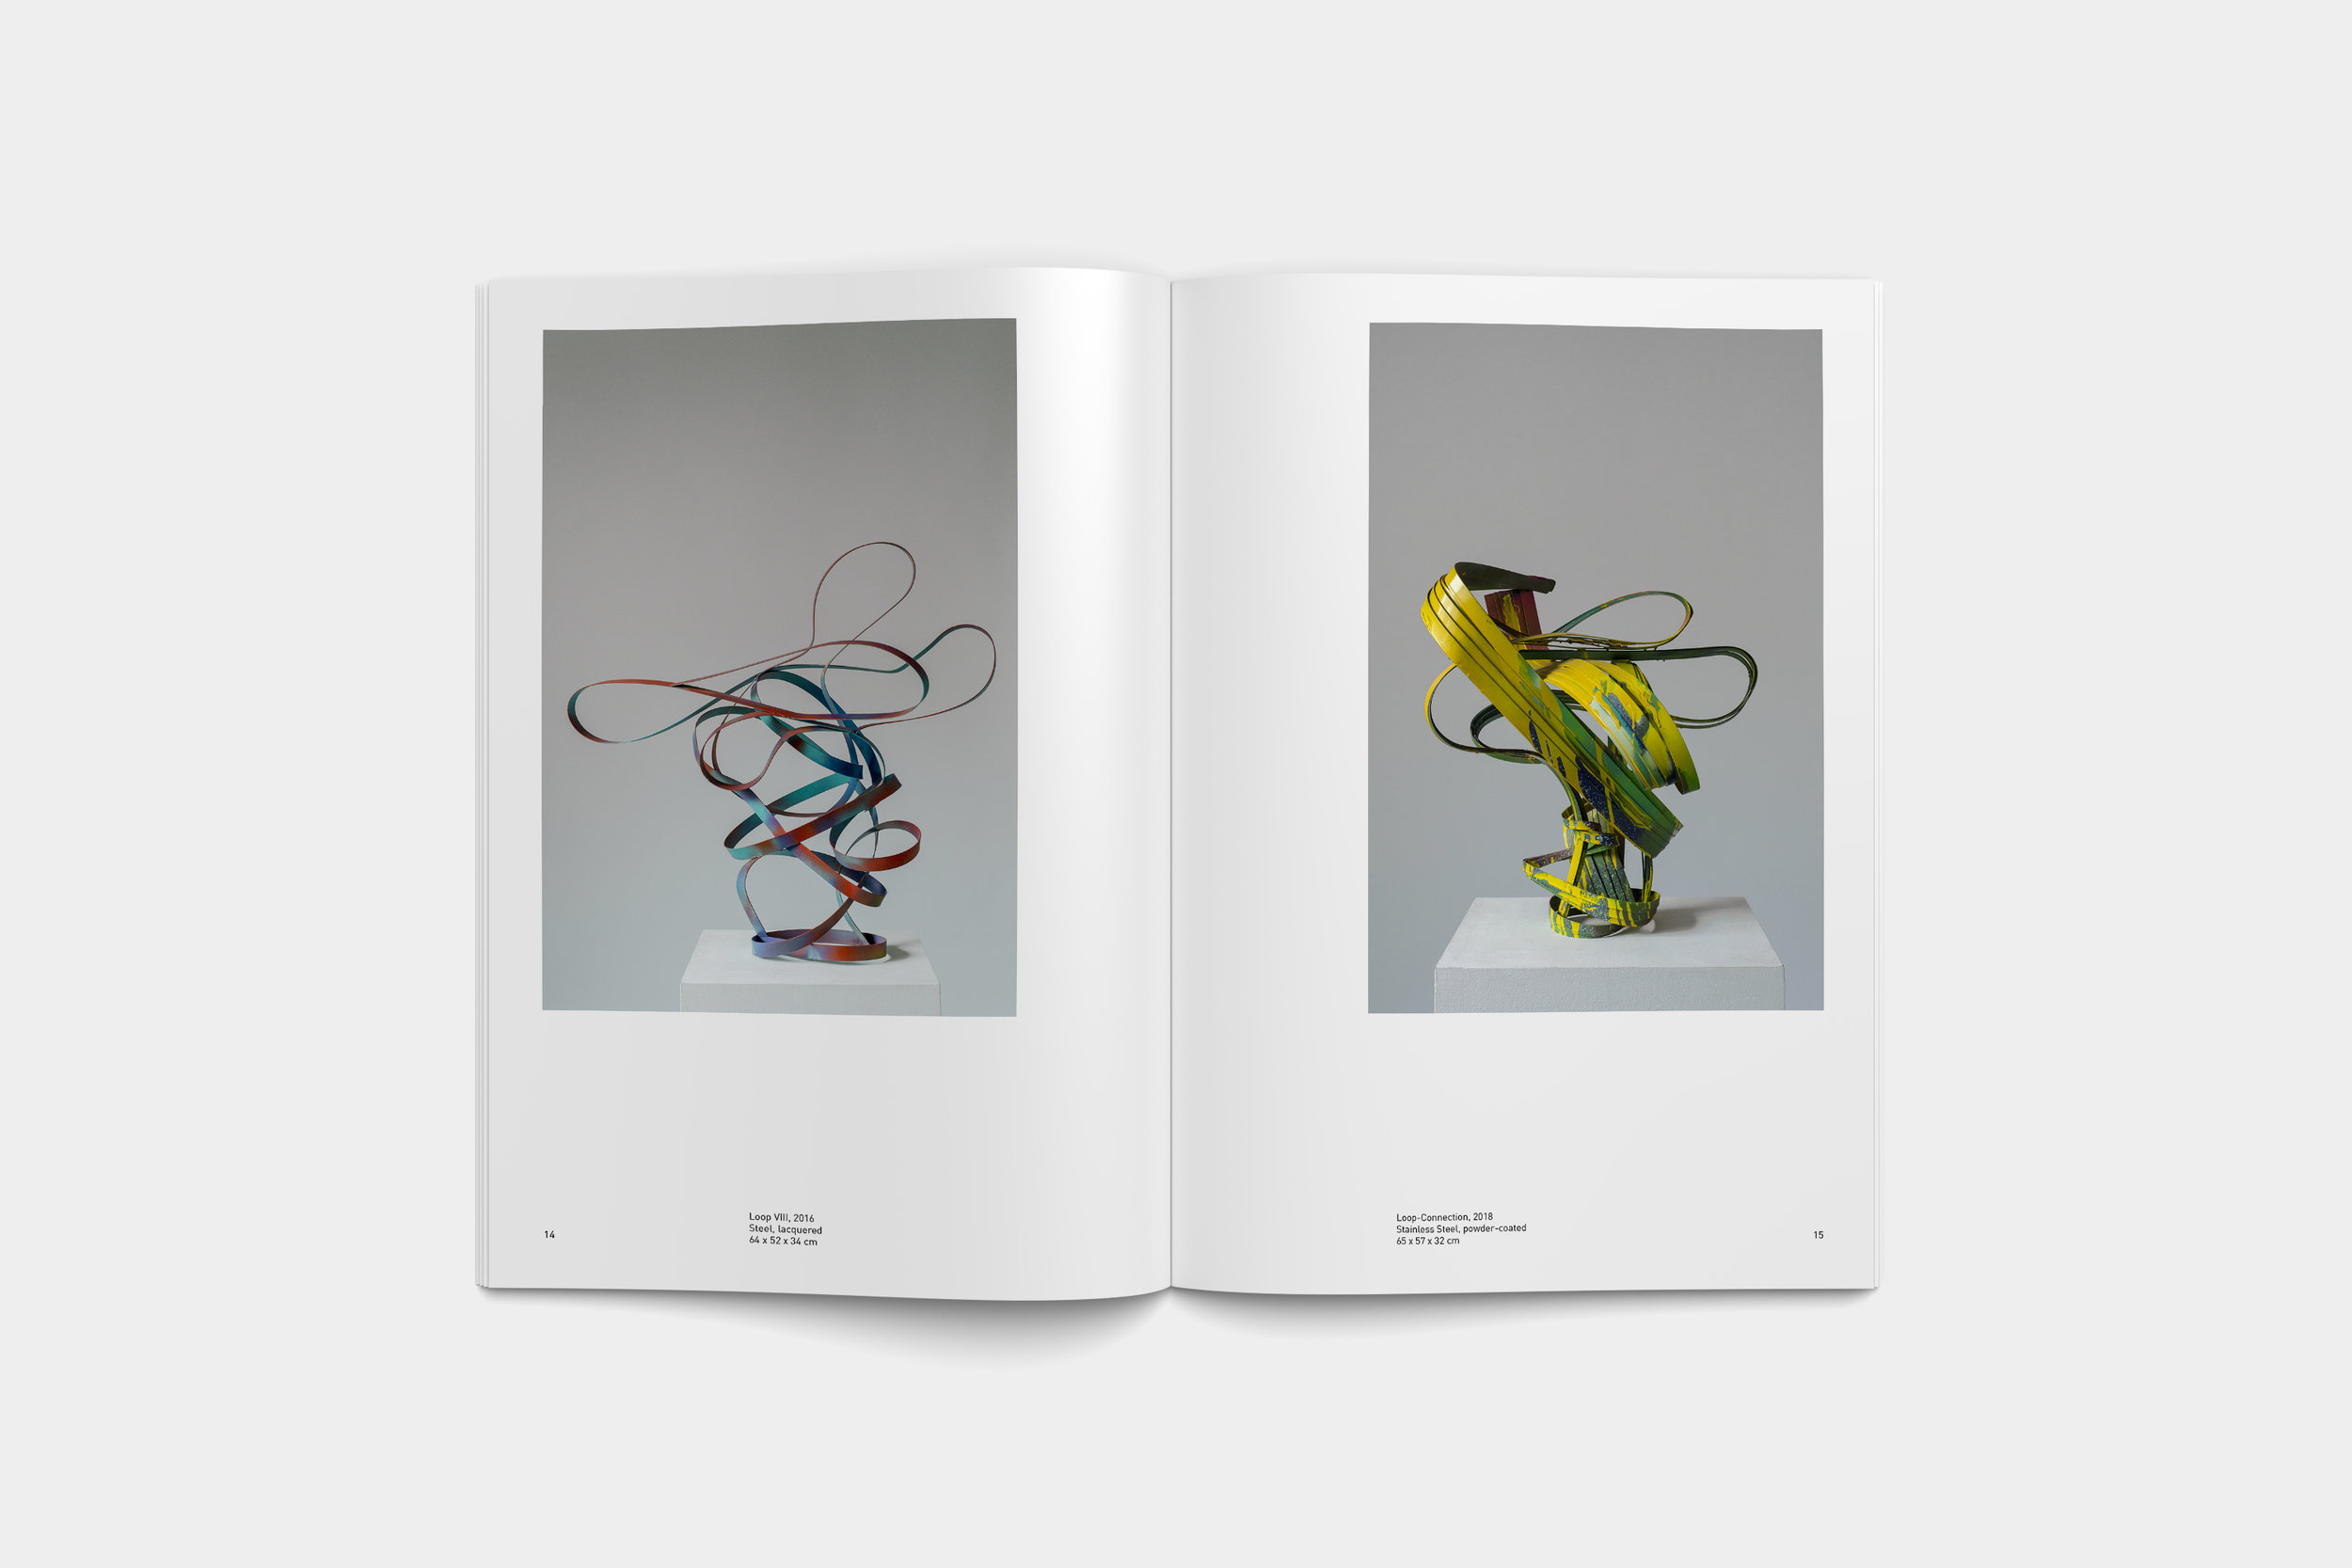 blank-rpr-art-catalog-peter-mueller-3.jpg